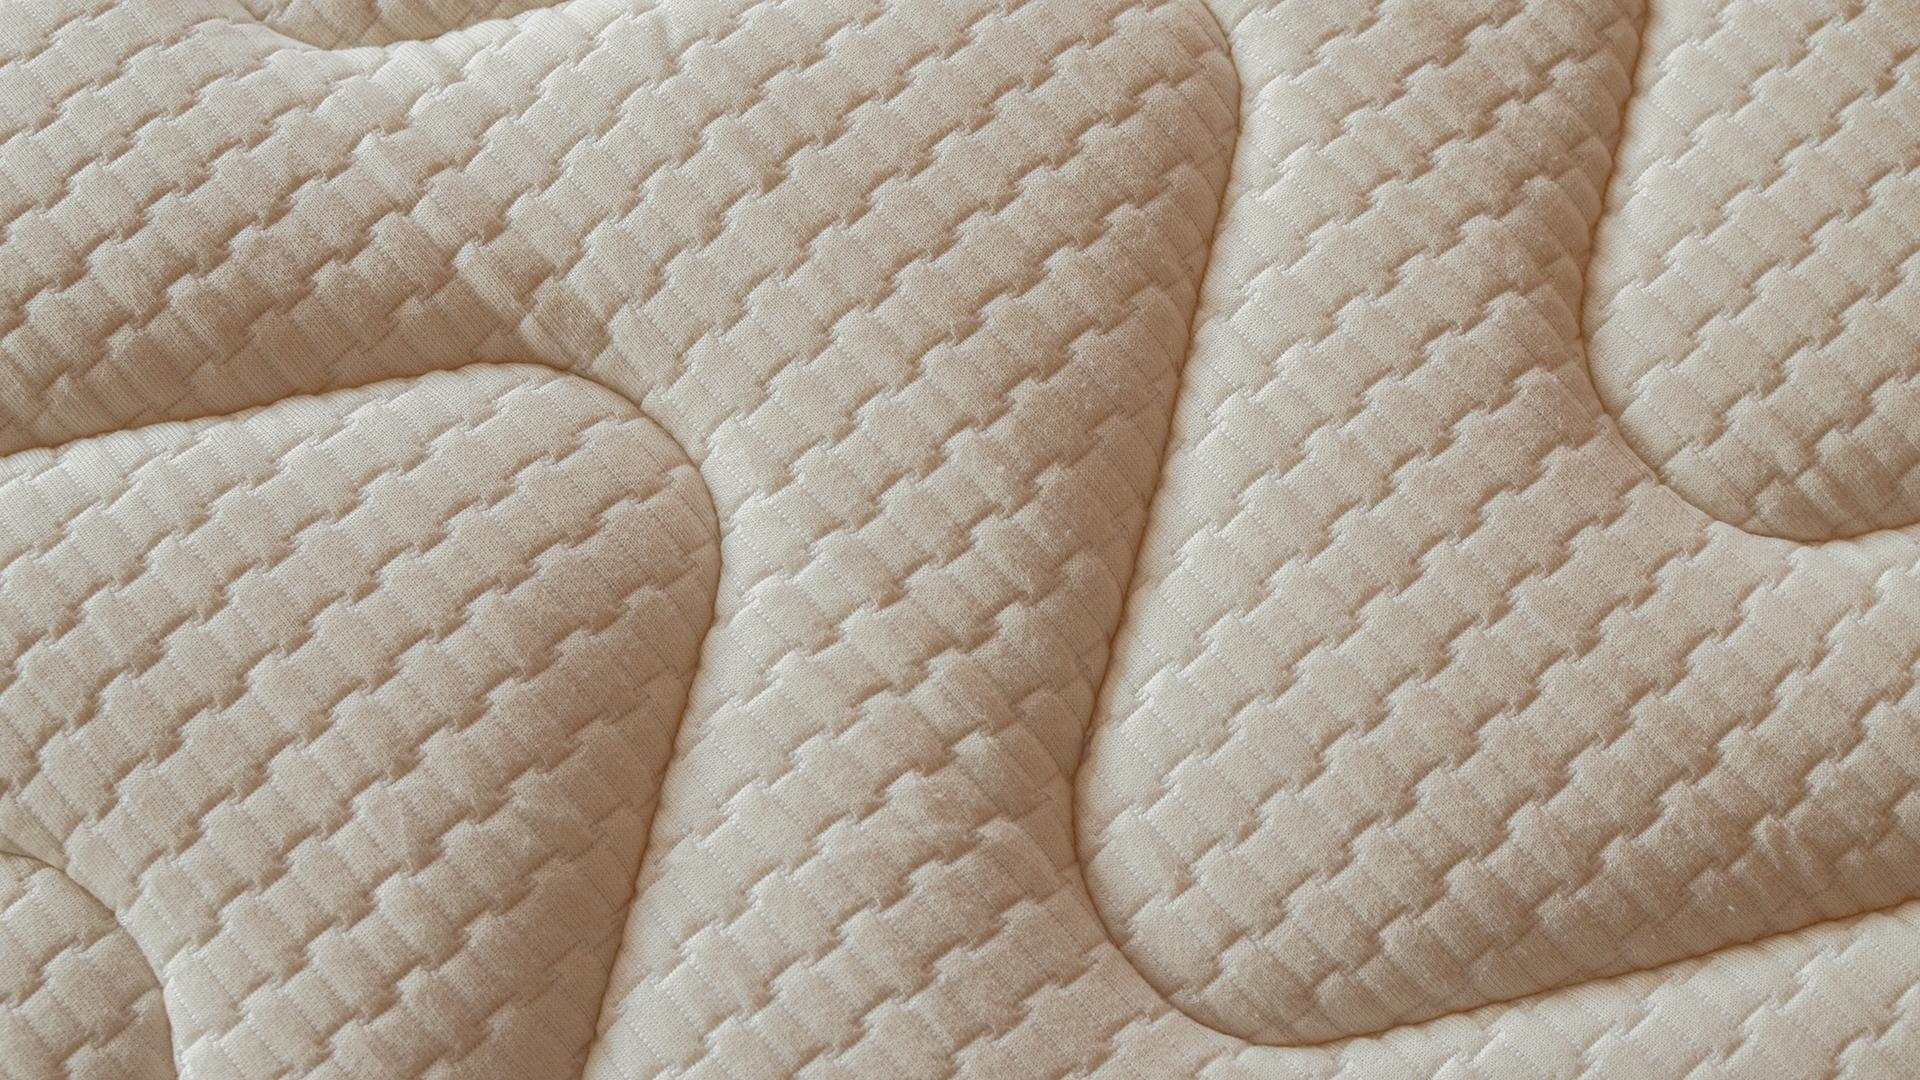 Organic cotton & wool reversible mattress topper - cotton side